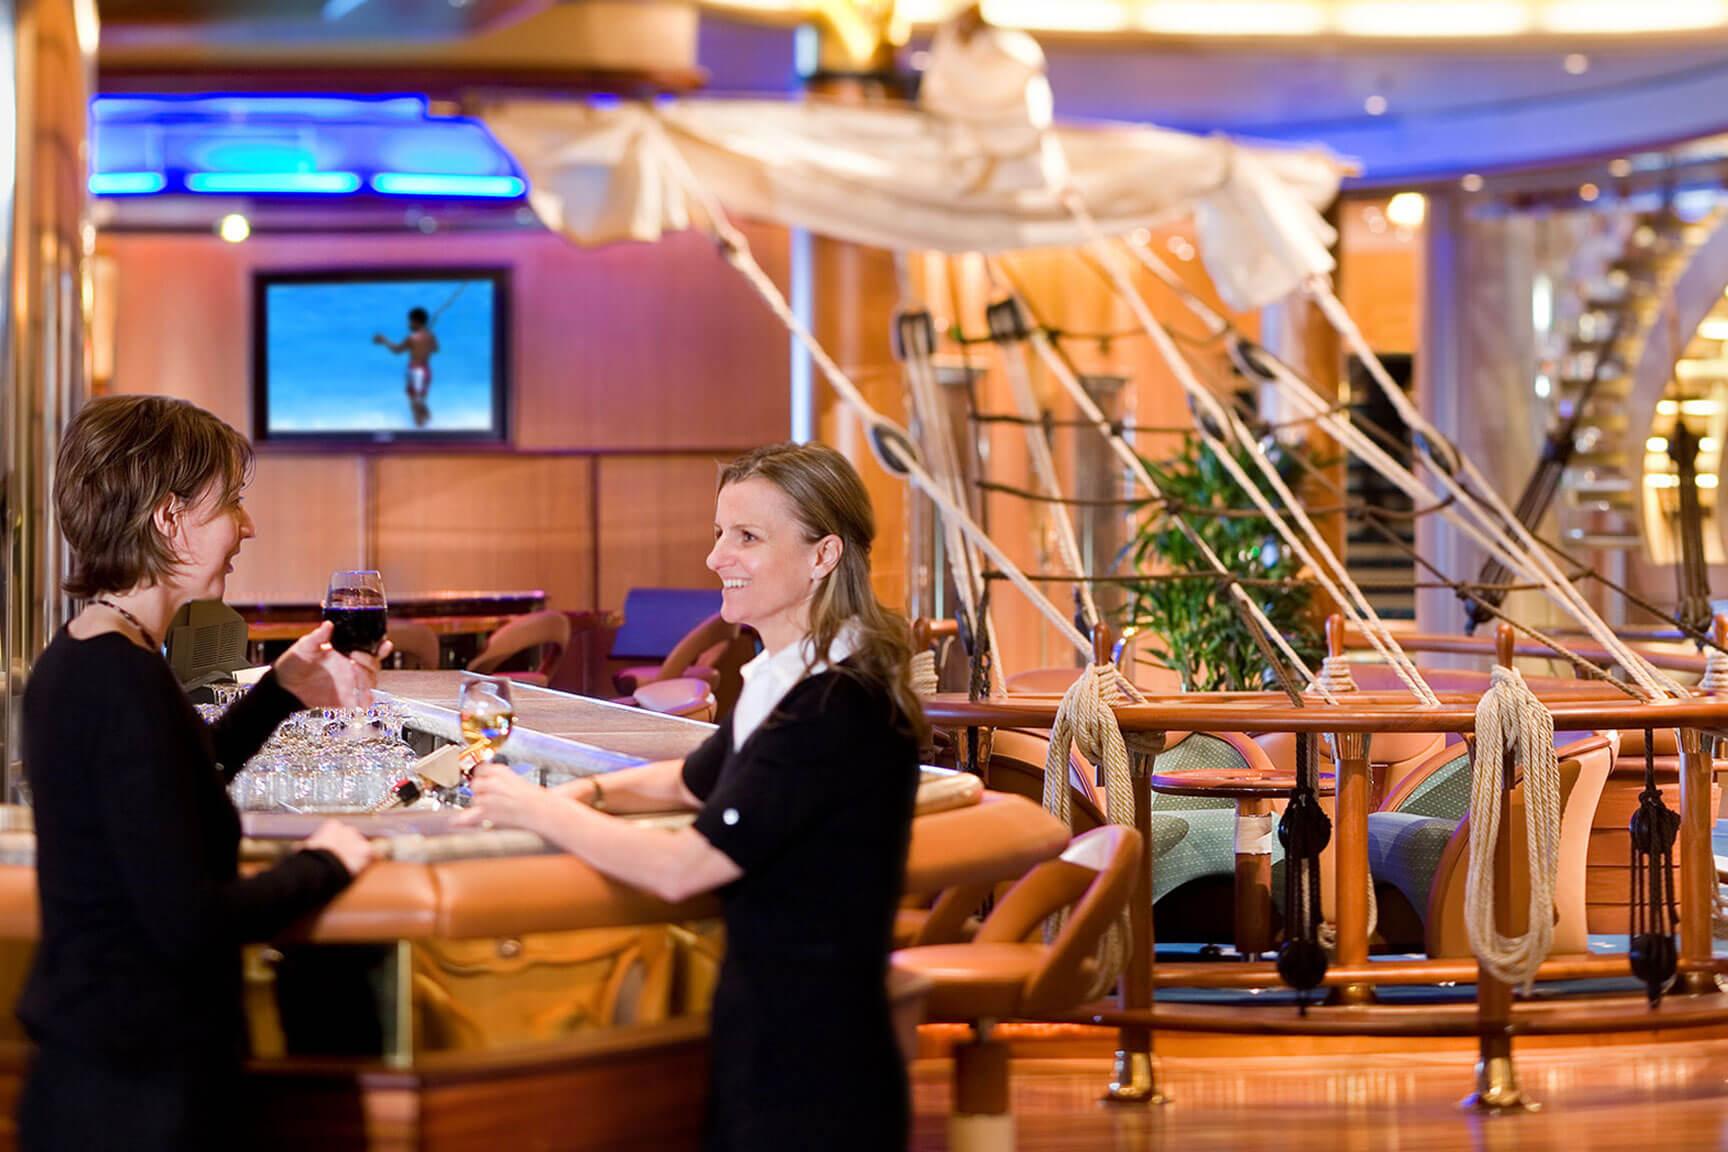 Royal Caribbean Independance of the seas Interior new schooner bar.jpg